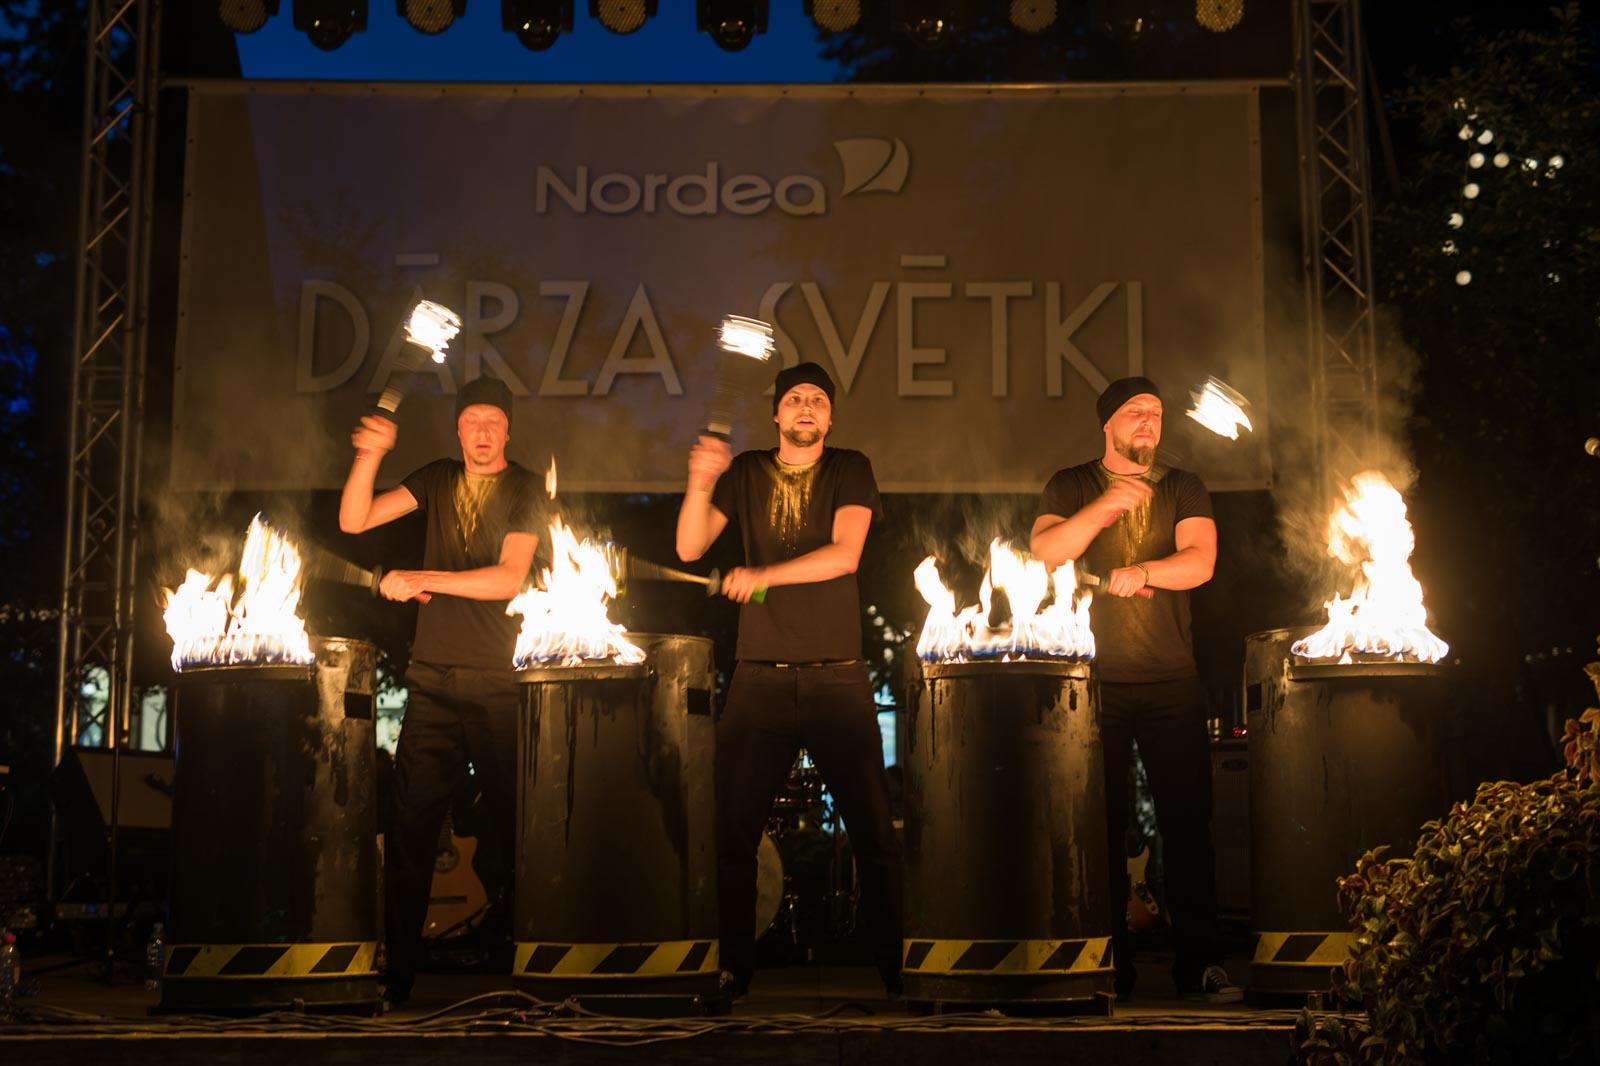 Nordea_DarzaSvetki_s-486